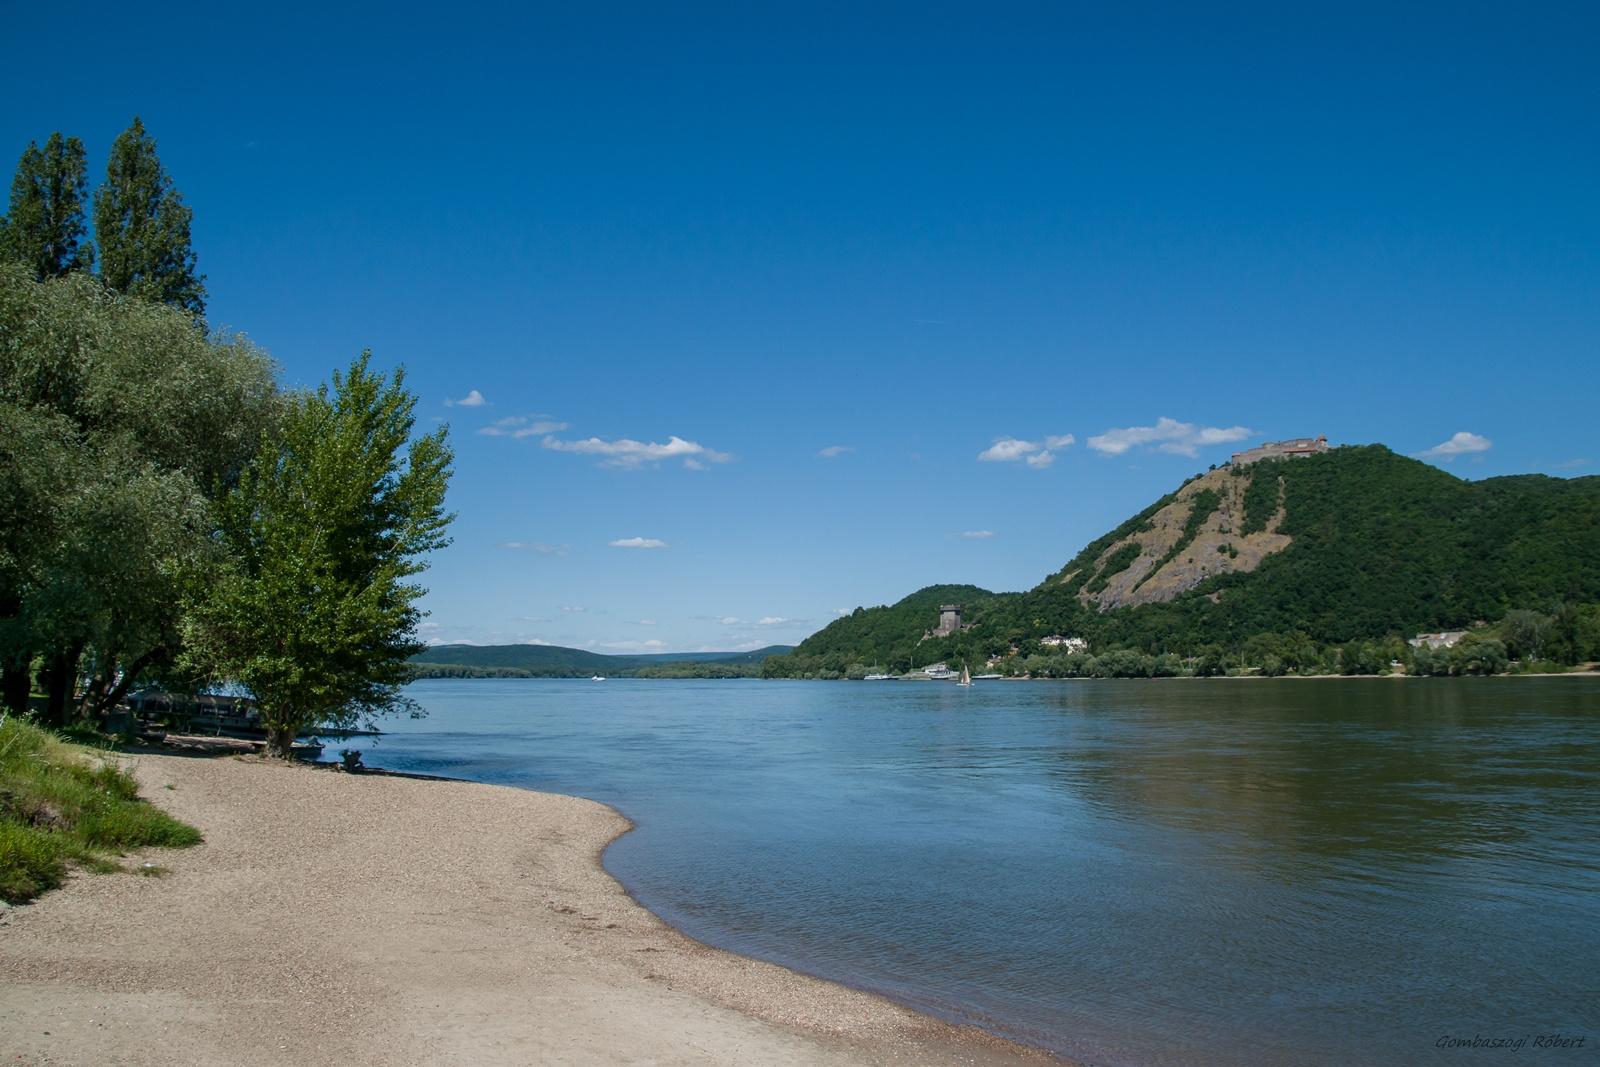 A Duna Visegrádnál